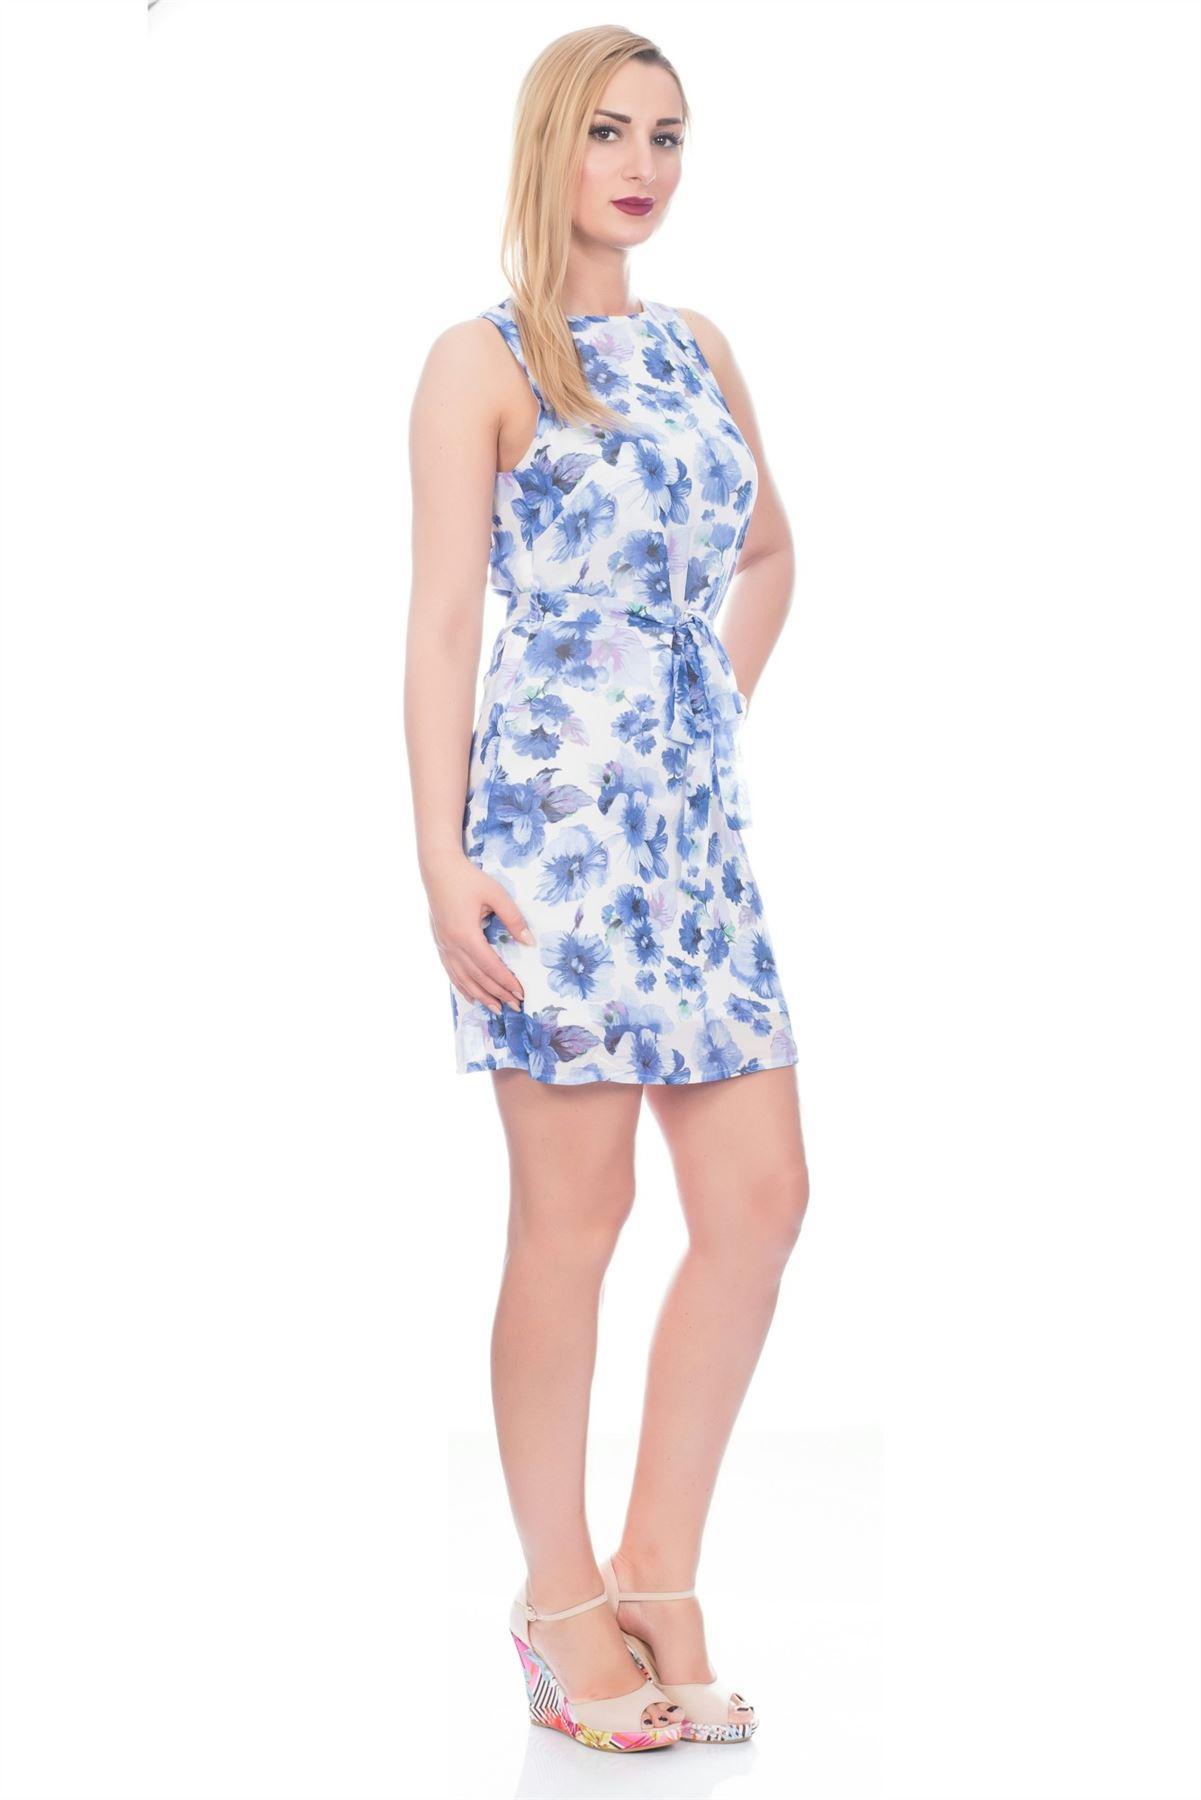 Ladies Short Lined Dress Light White Blue for Prom Wedding ...